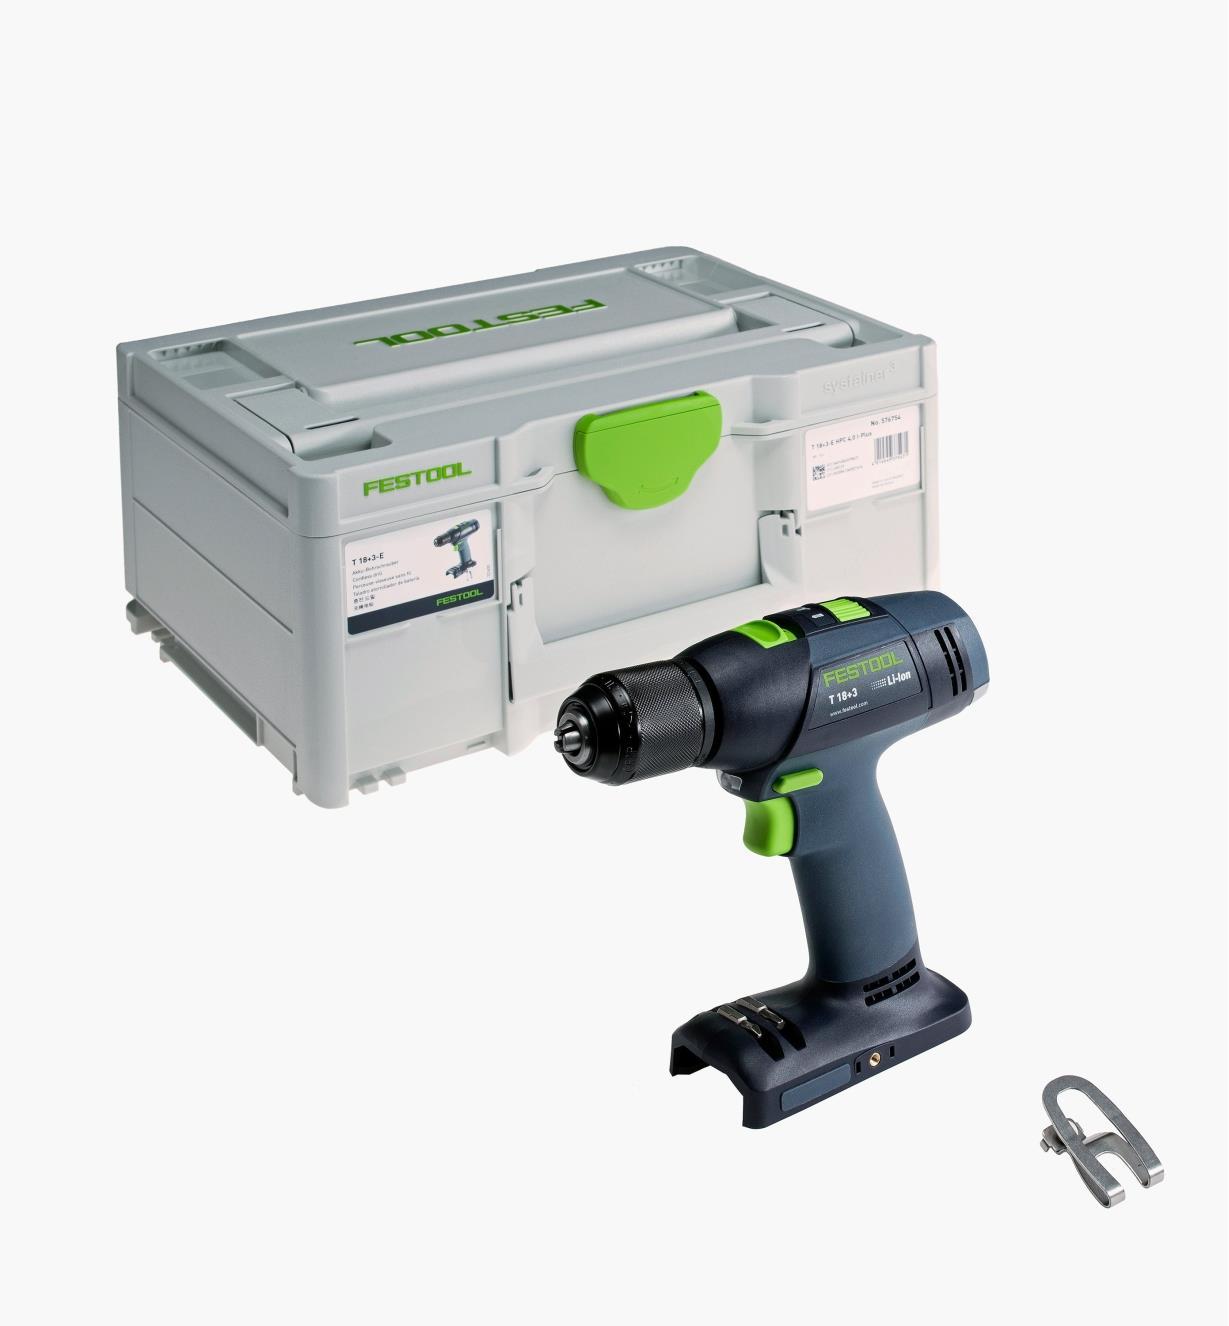 Festool T 18 3 Easy Cordless Drill Basic